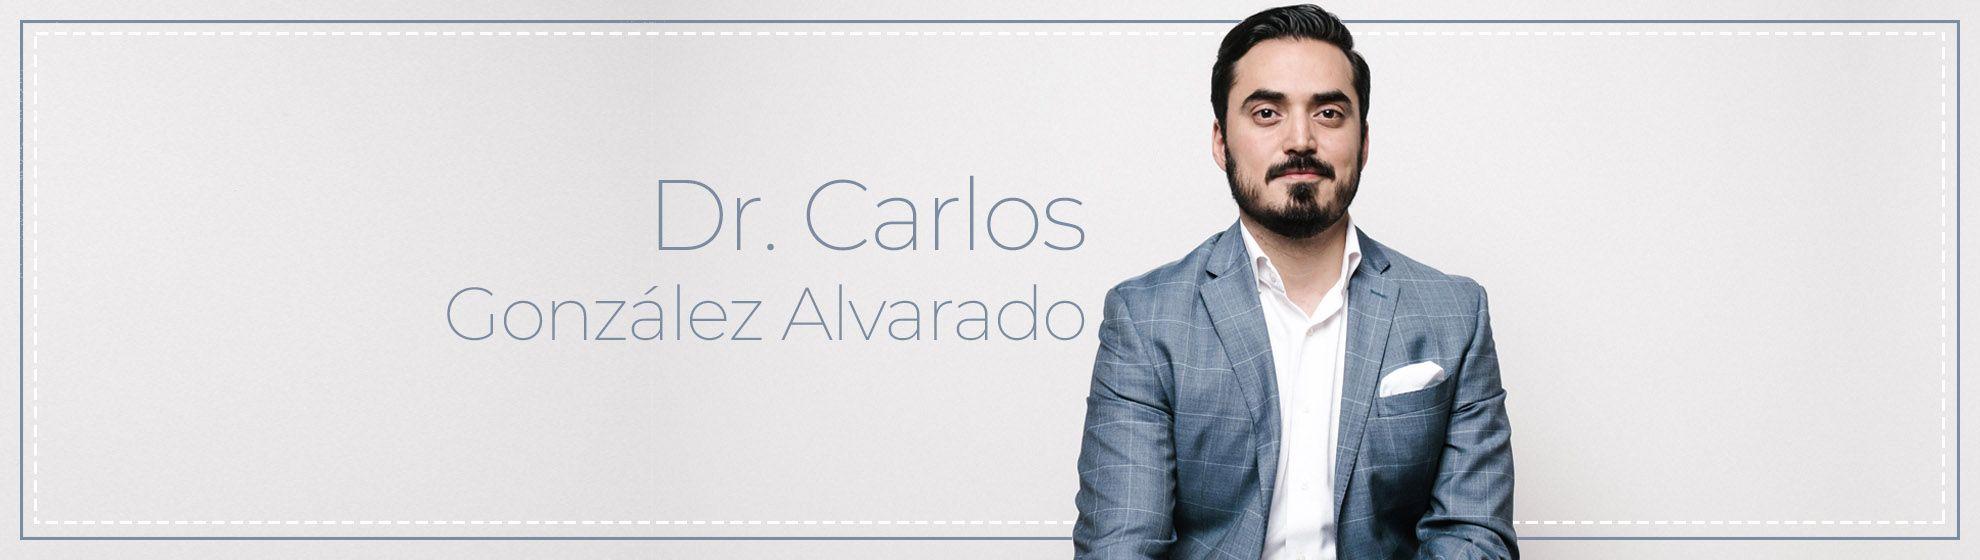 Dr. Carlos González Alvarado